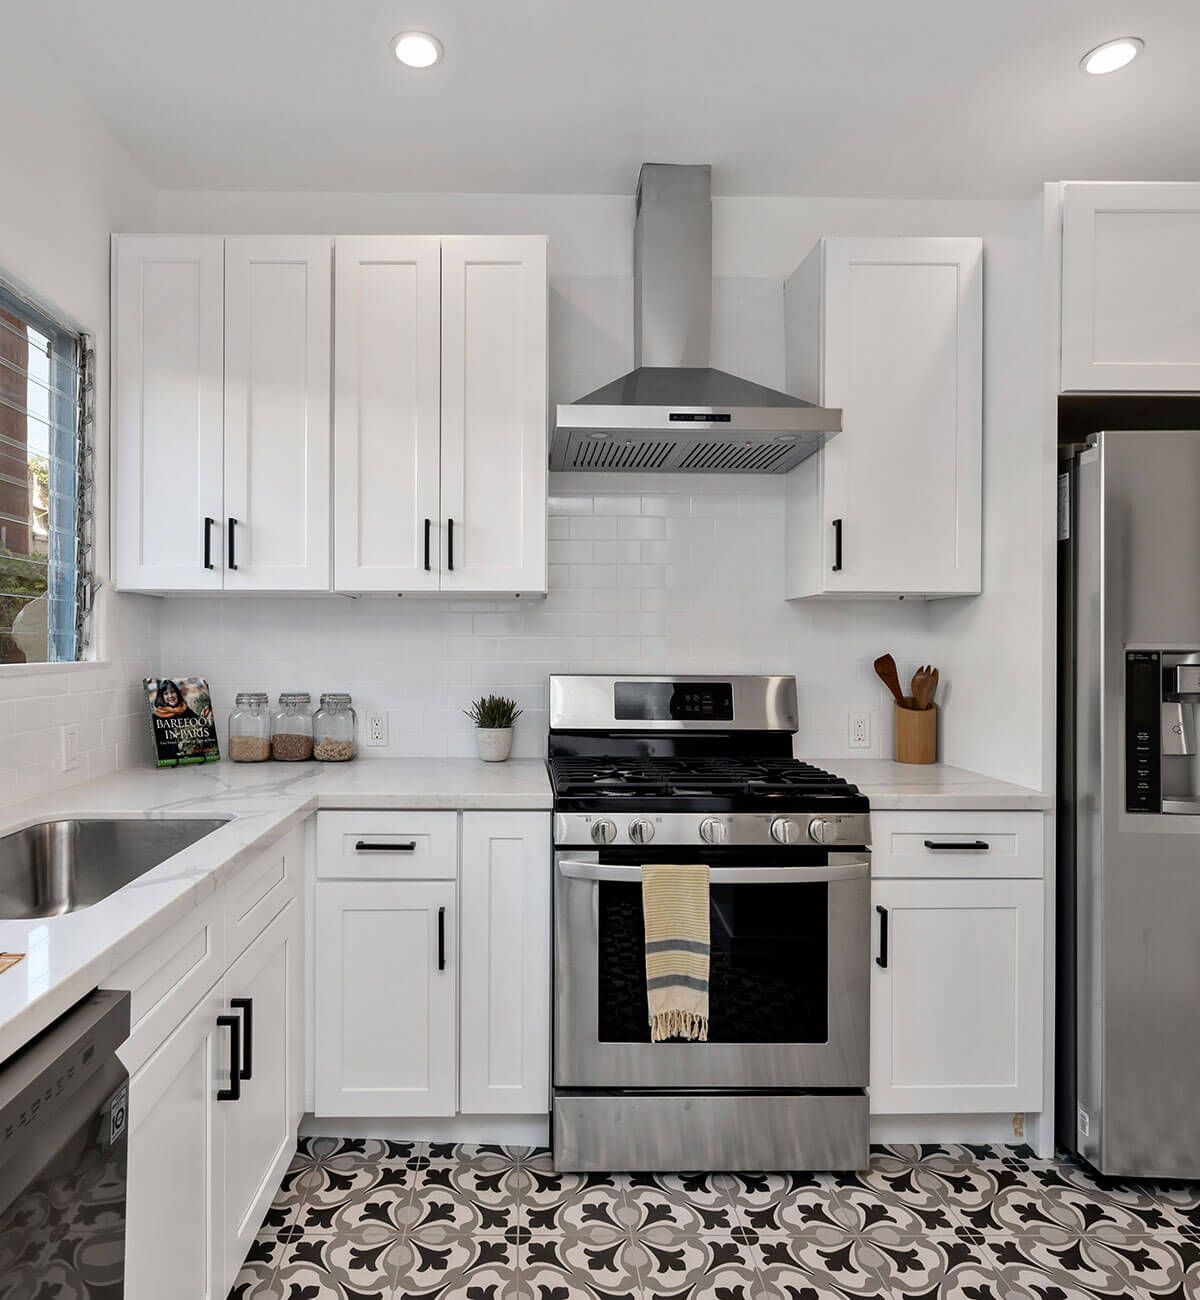 The Hayworth Interior-Kitchen